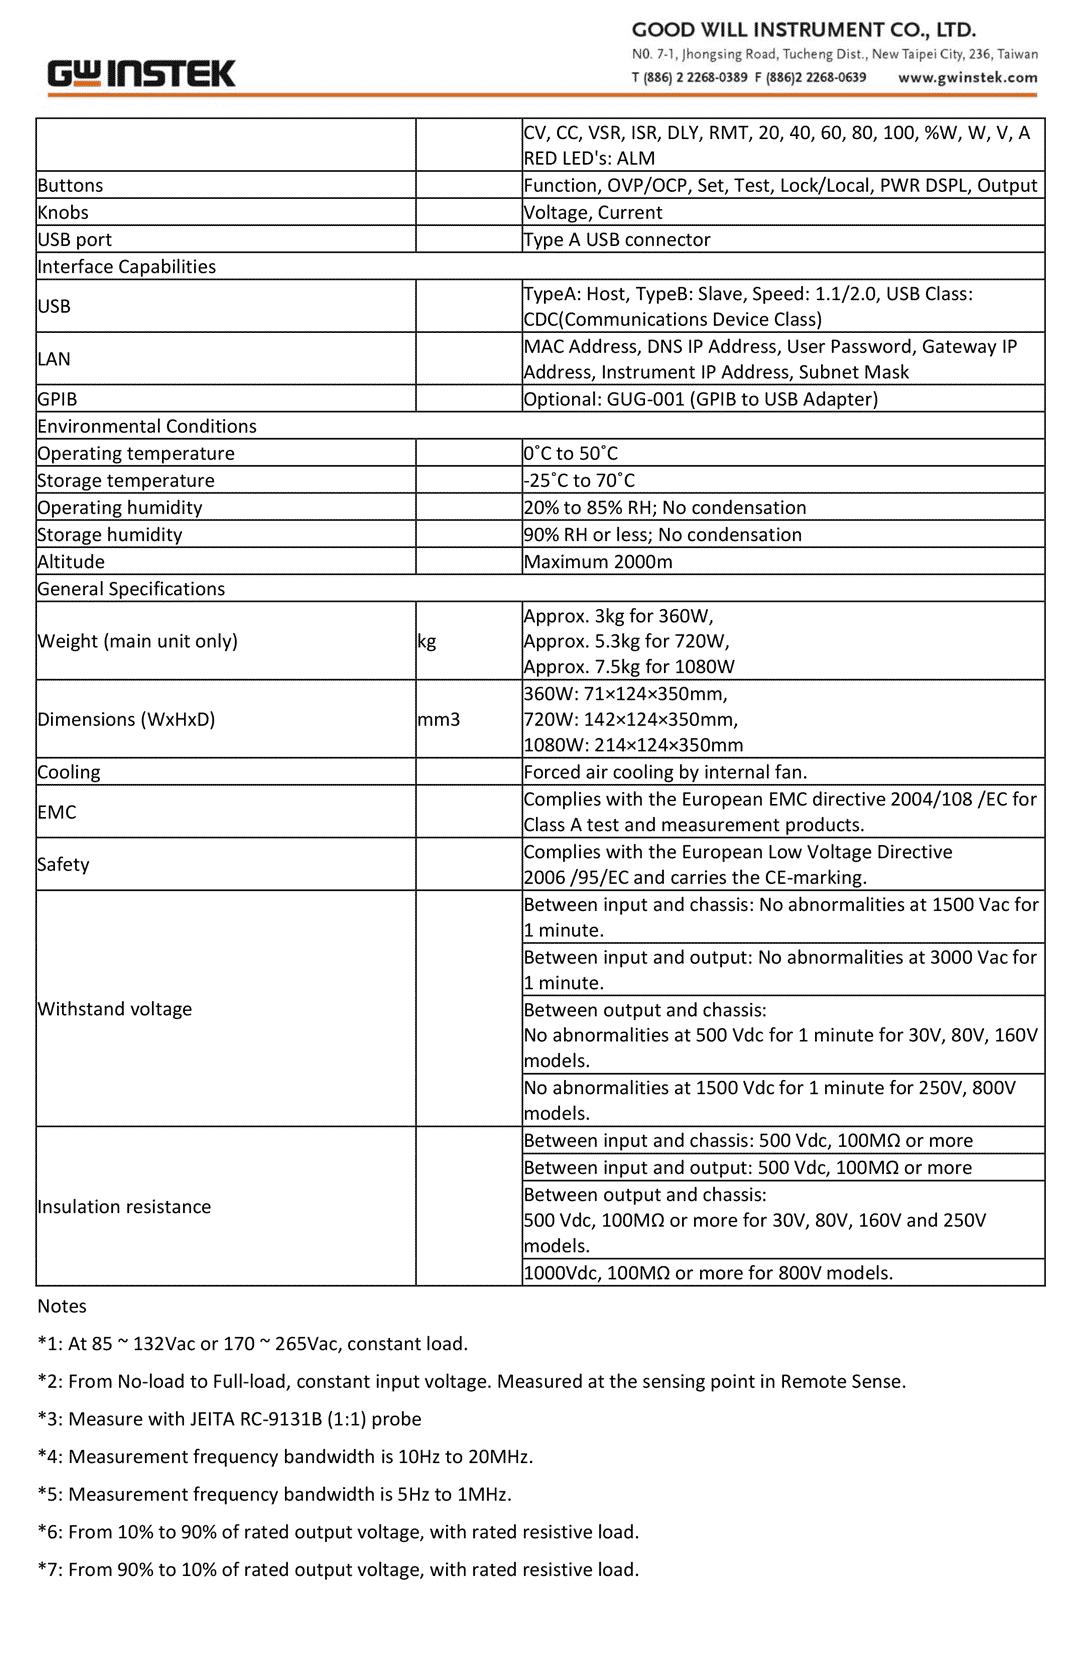 Spec GW Instek PSW 80-40.5-2